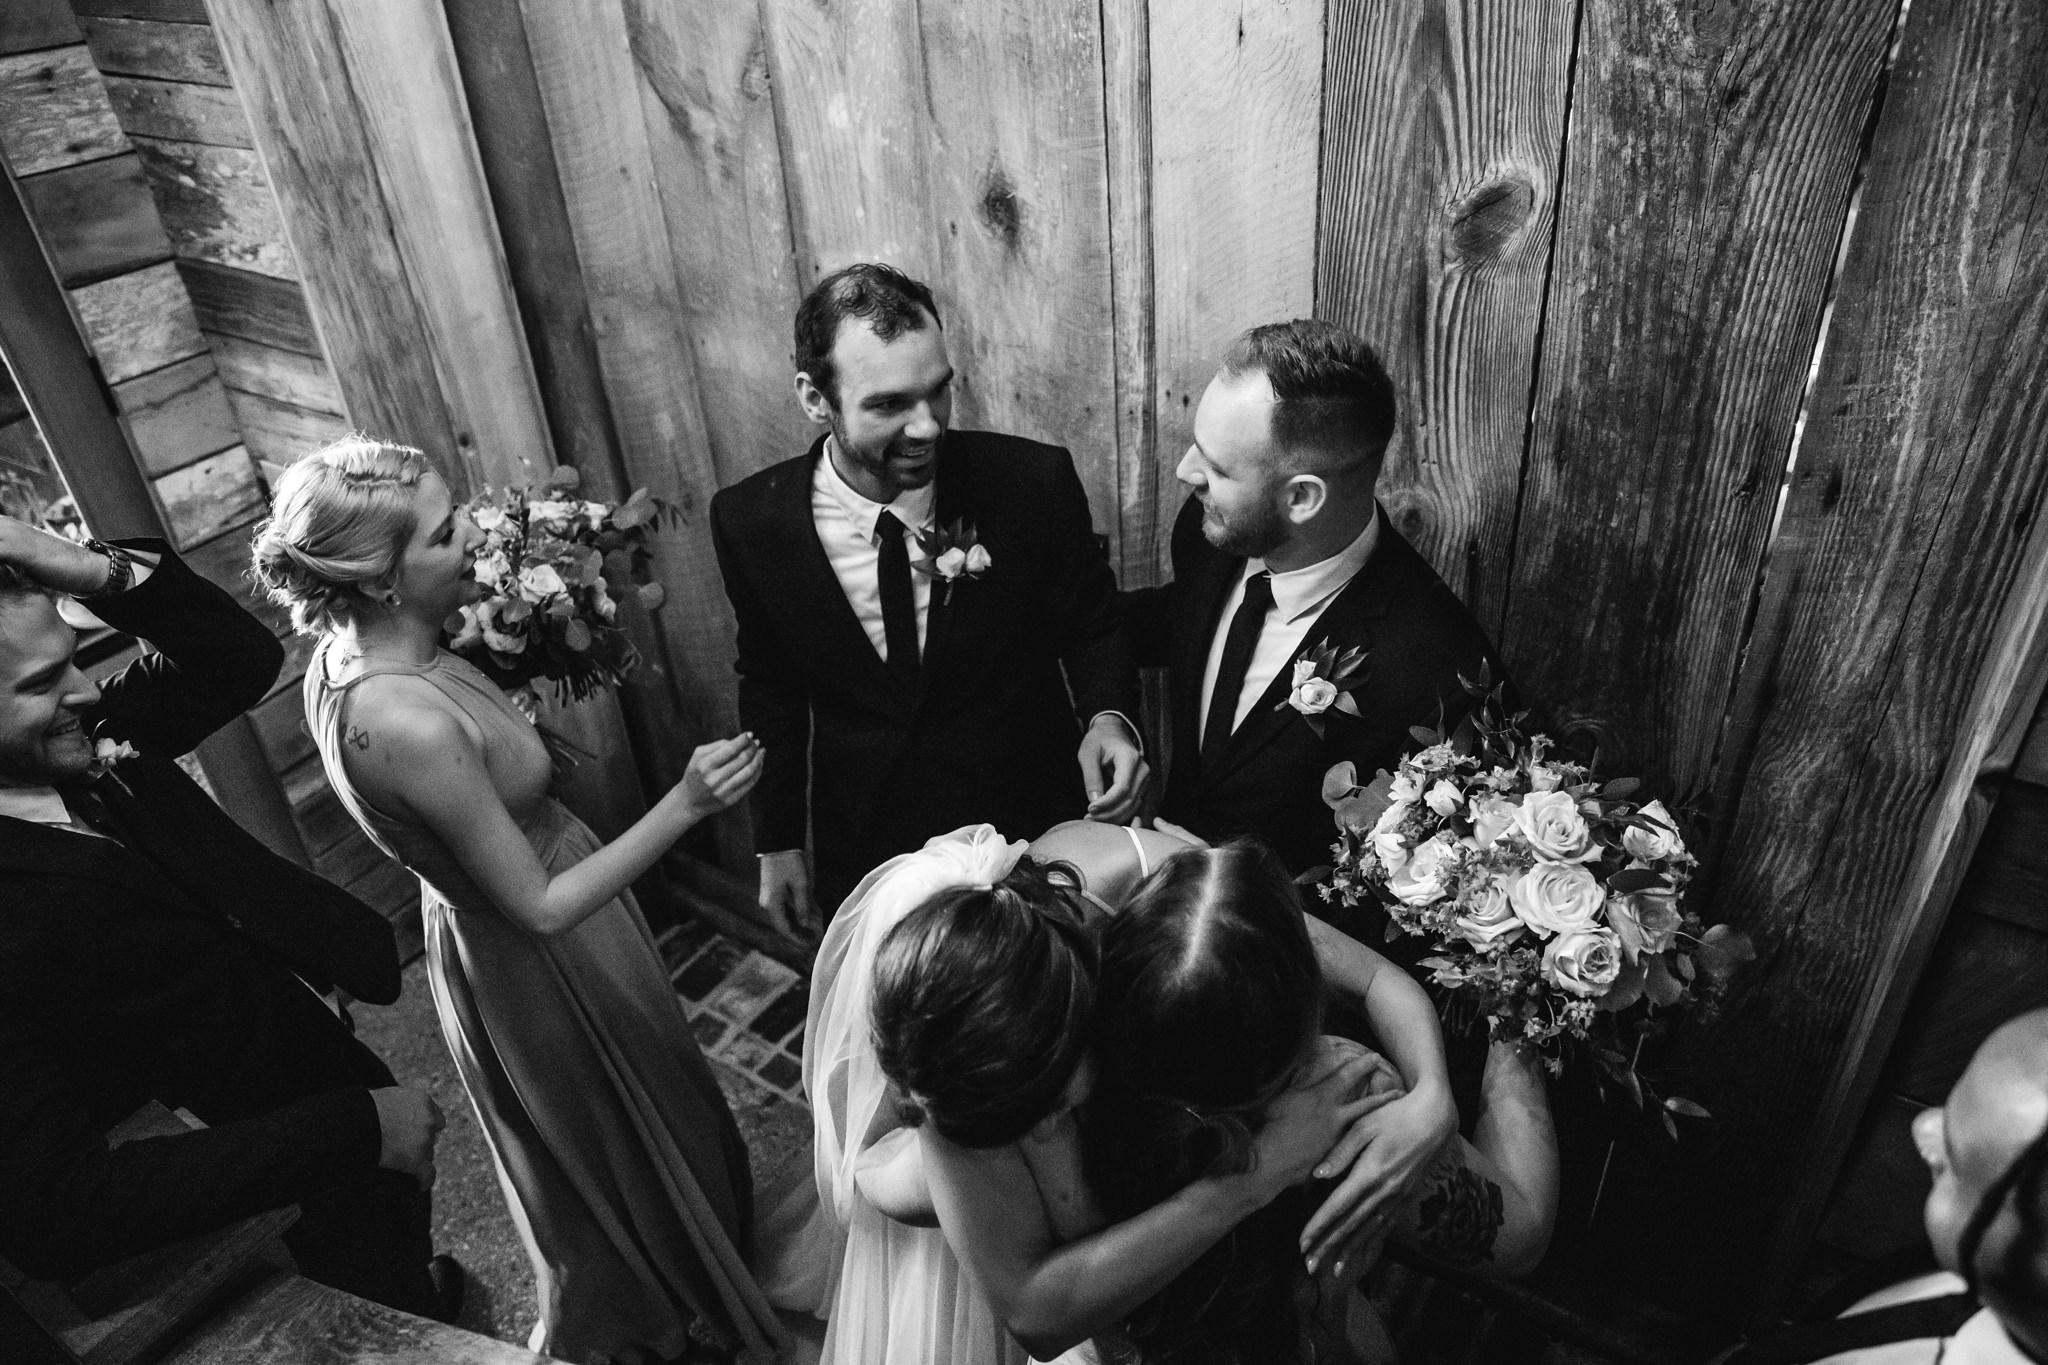 phantom-canyon-brewery-colorado-springs-wedding-photographer-412.jpg